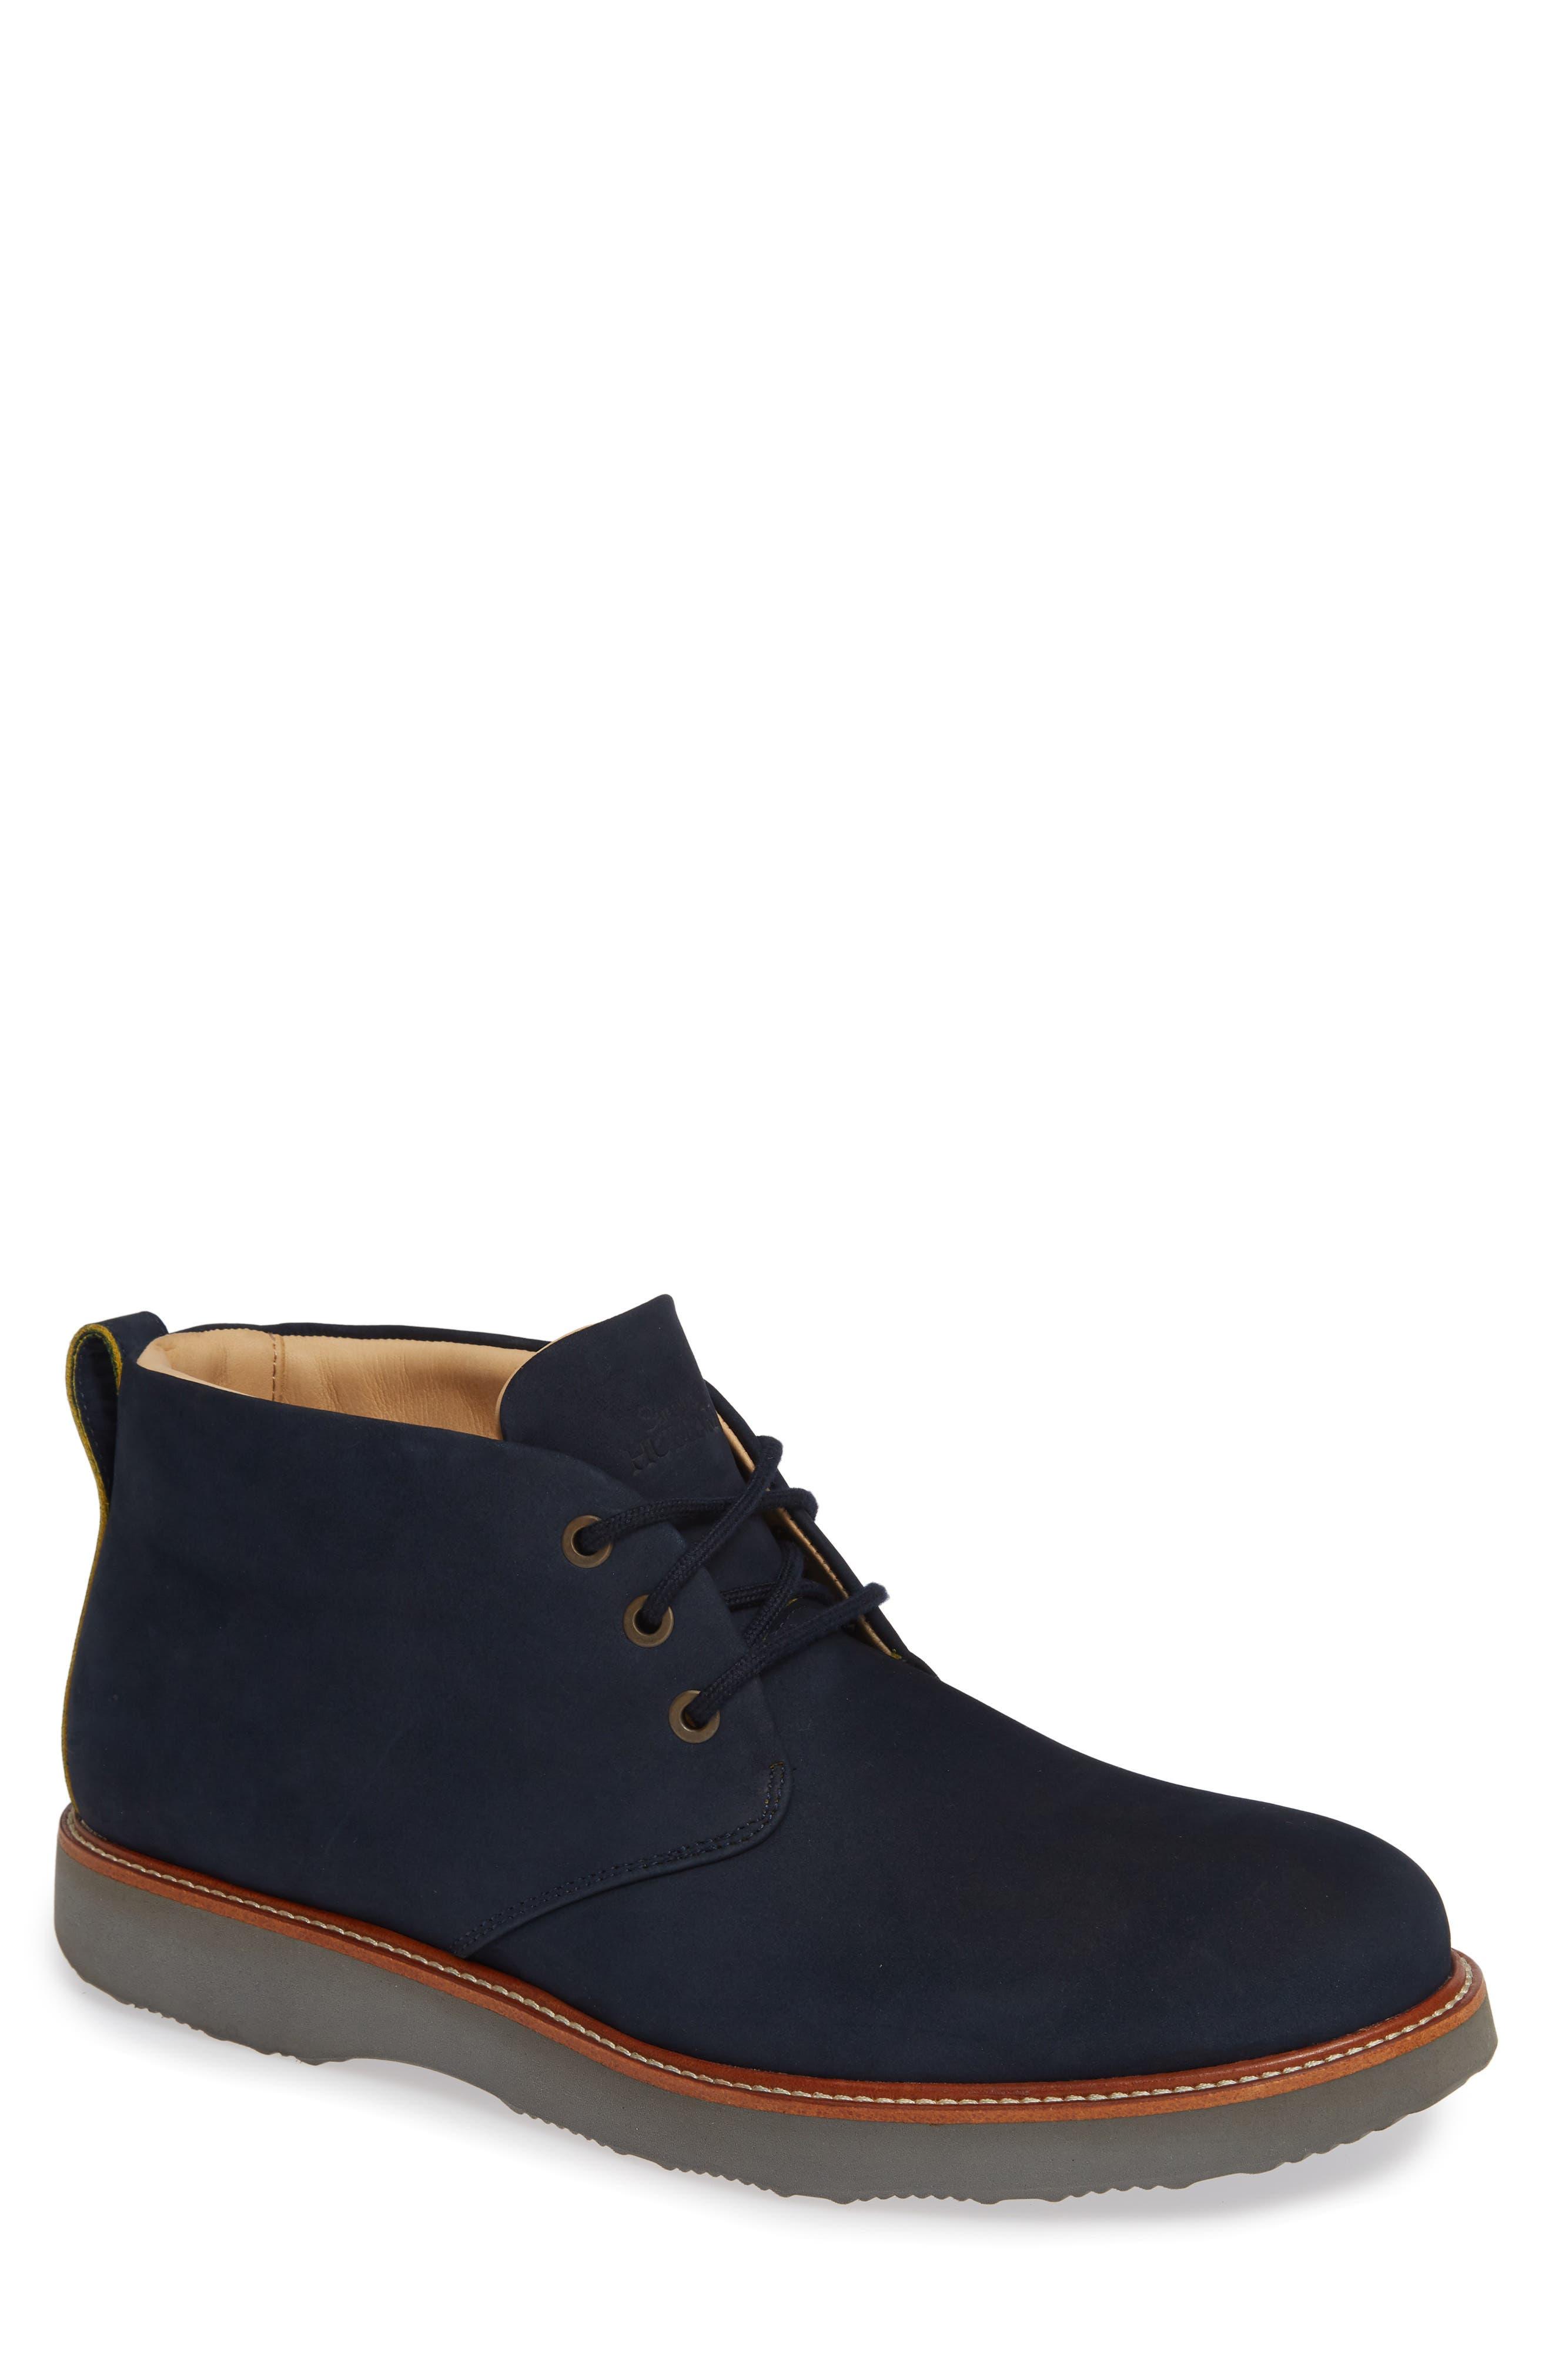 Samuel Hubbard Re-Boot Chukka Boot- Blue